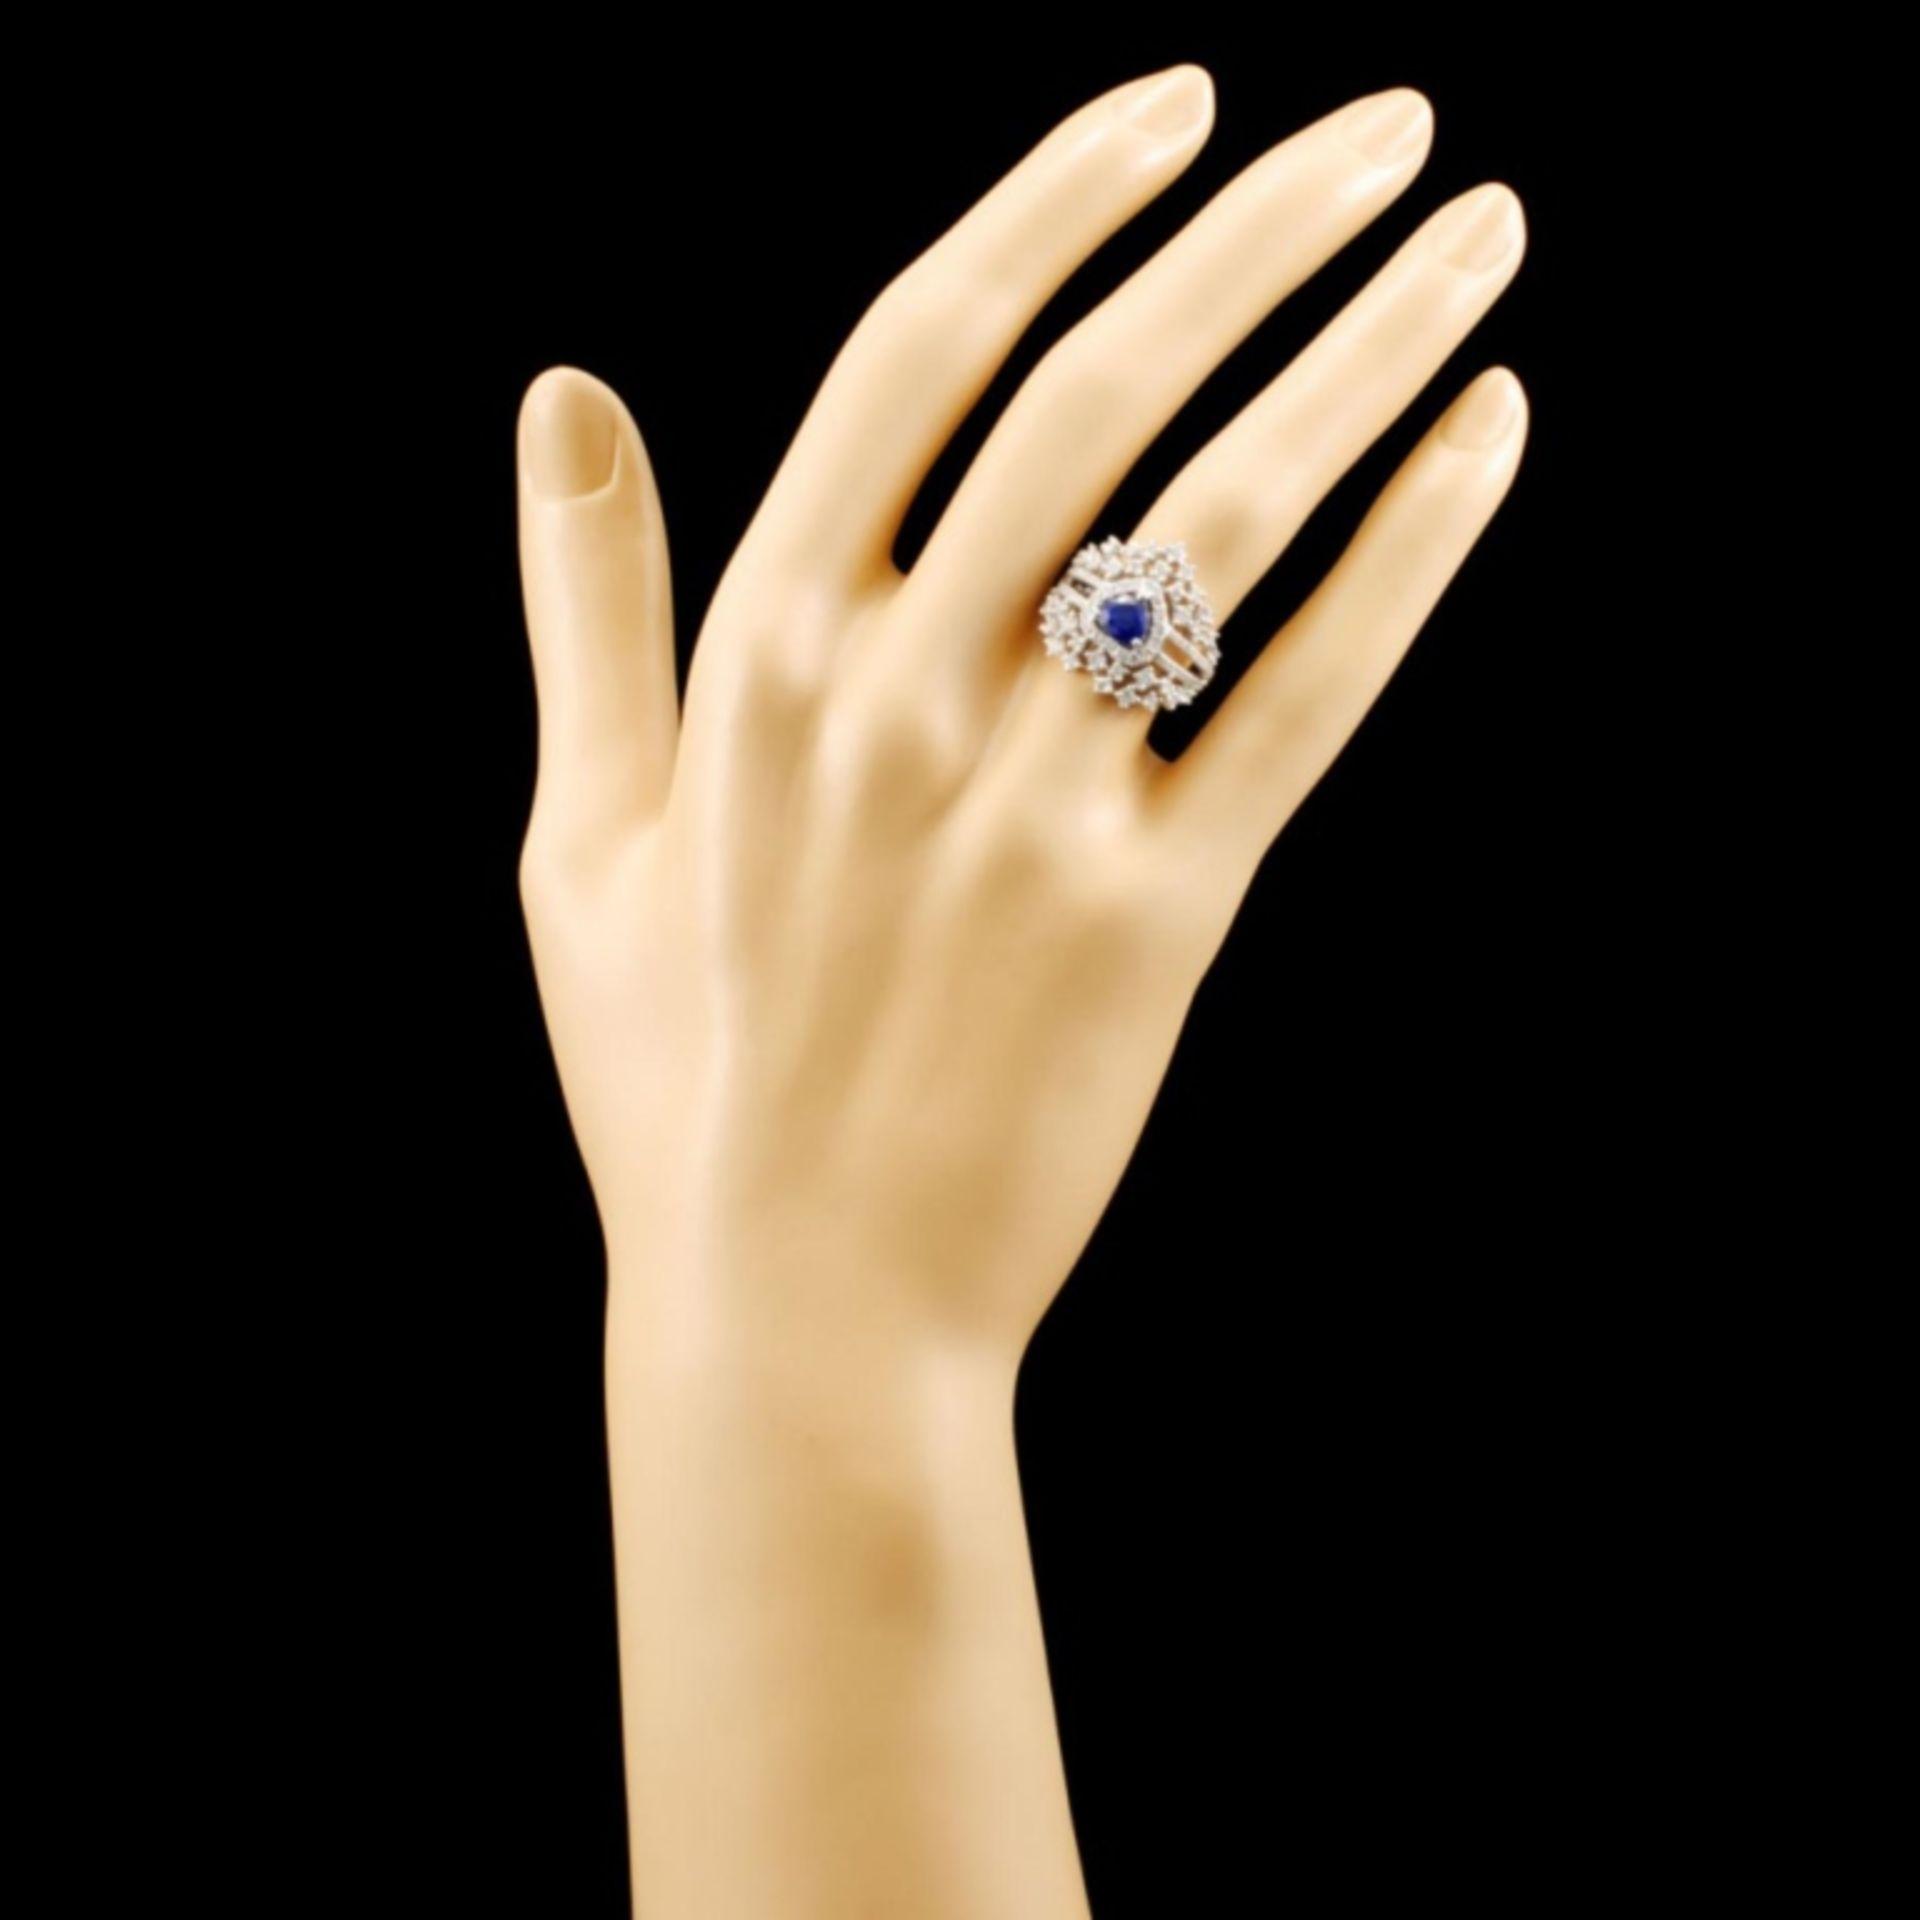 18K Gold 0.83ct Sapphire & 1.02ctw Diamond Ring - Image 4 of 4